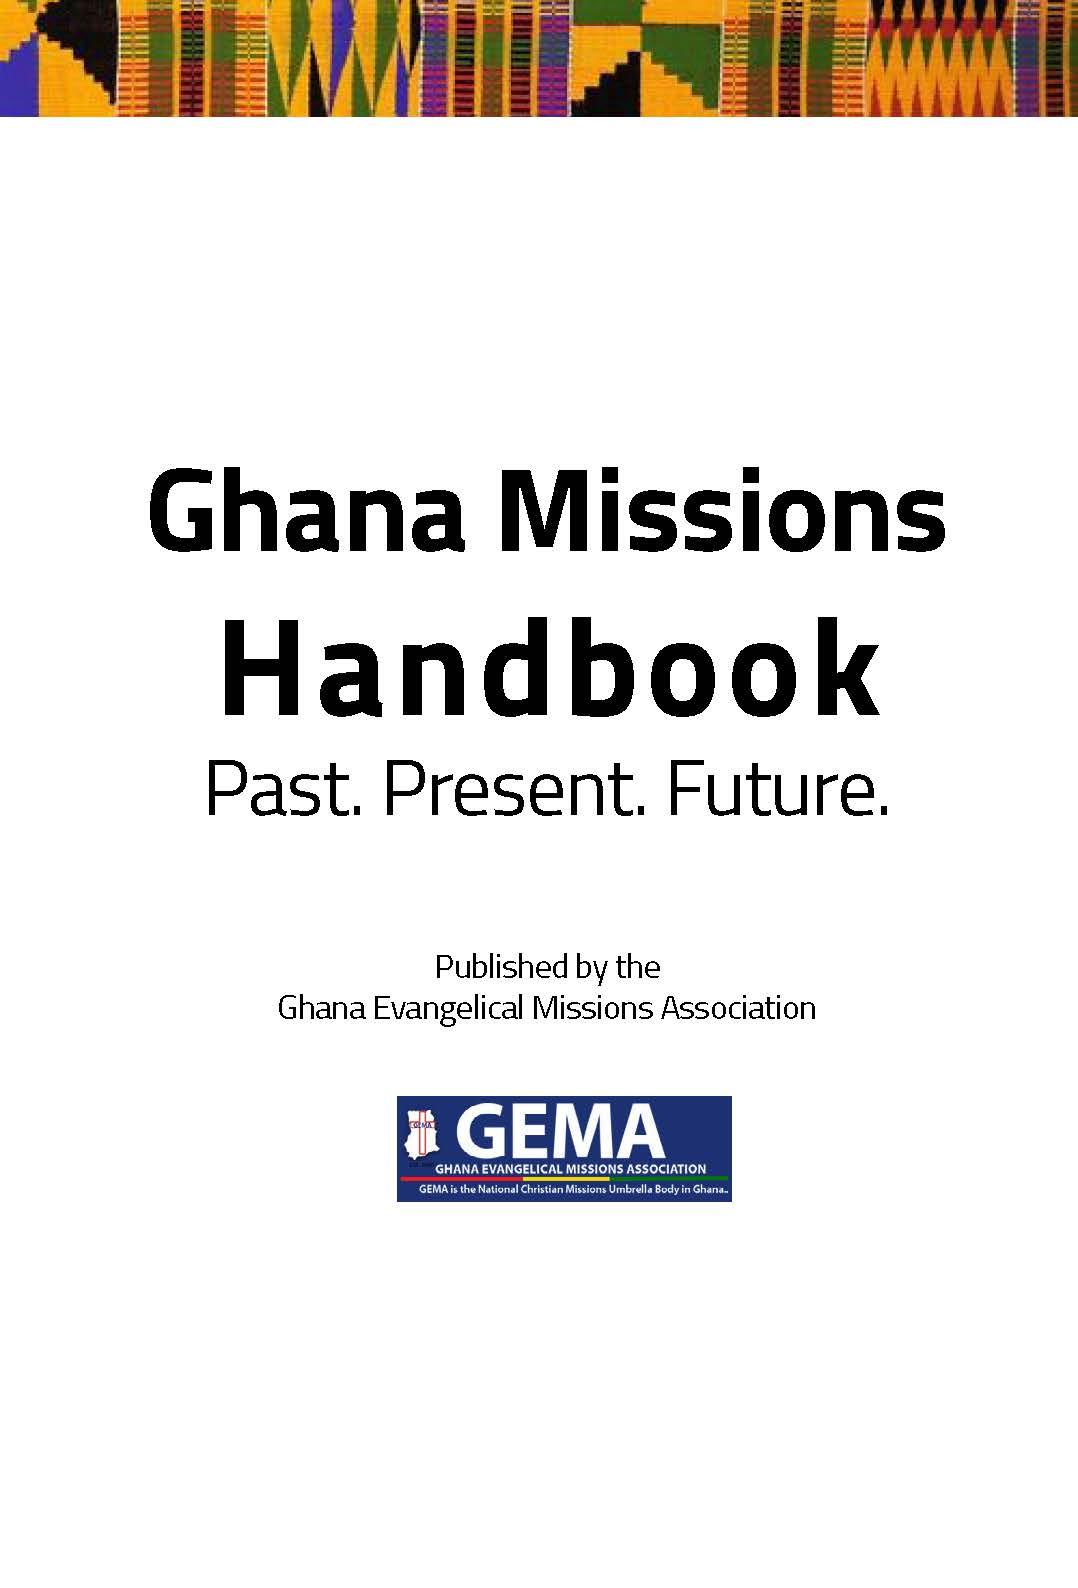 Ghana Missions Handbook_GEMA_Page_004